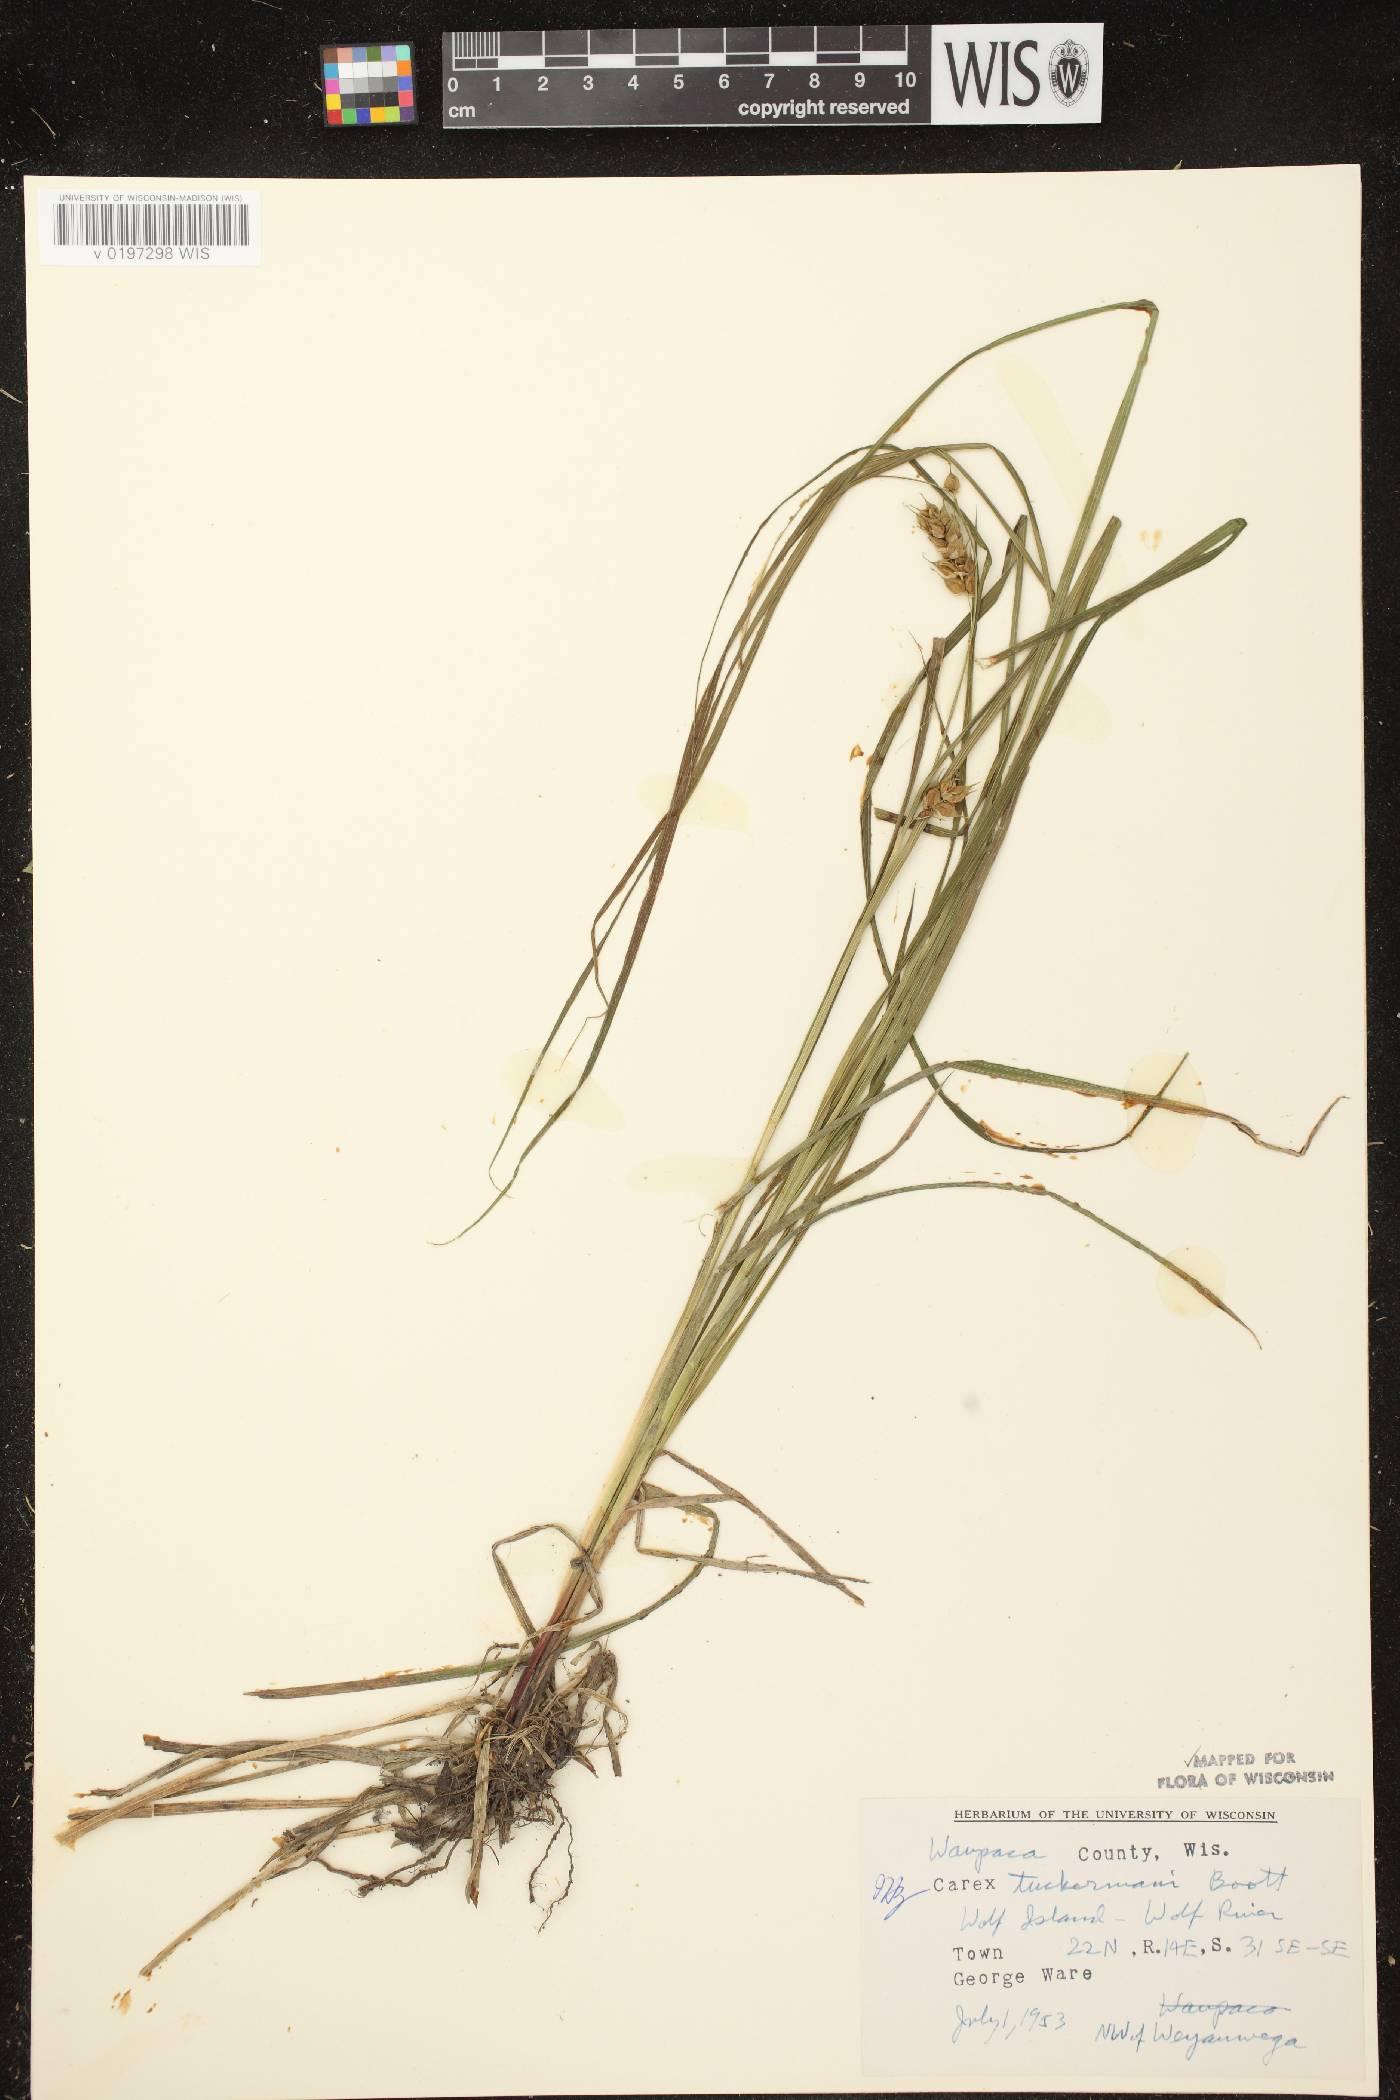 Carex tuckermanii image